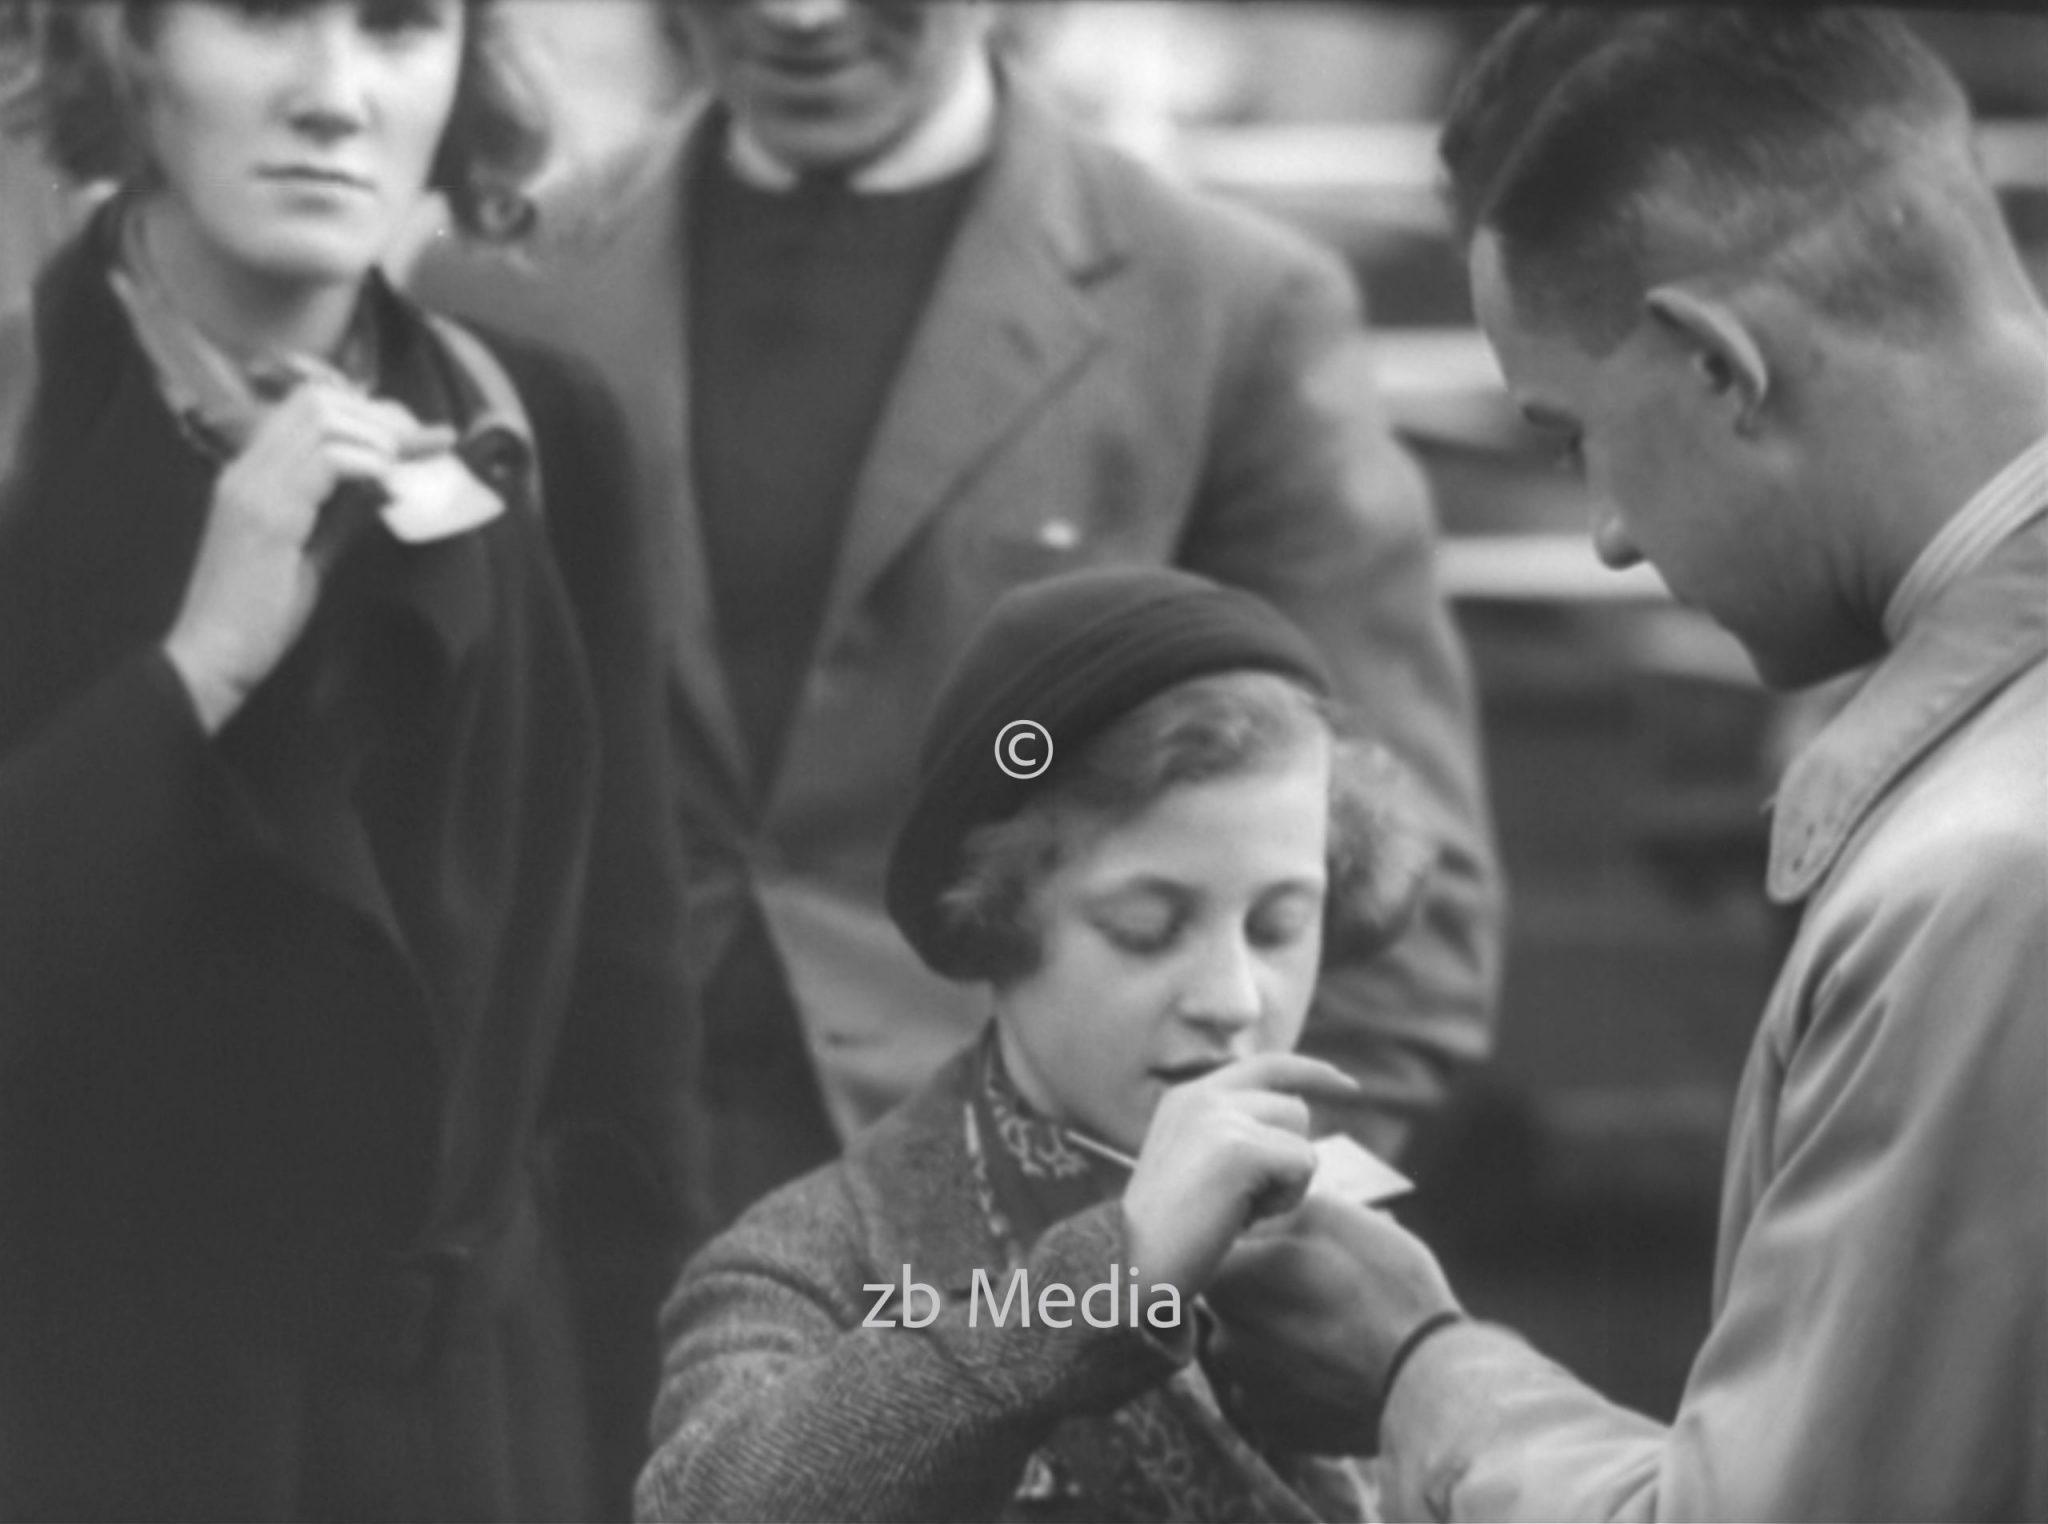 Erster Kindertransport erreicht England 1938